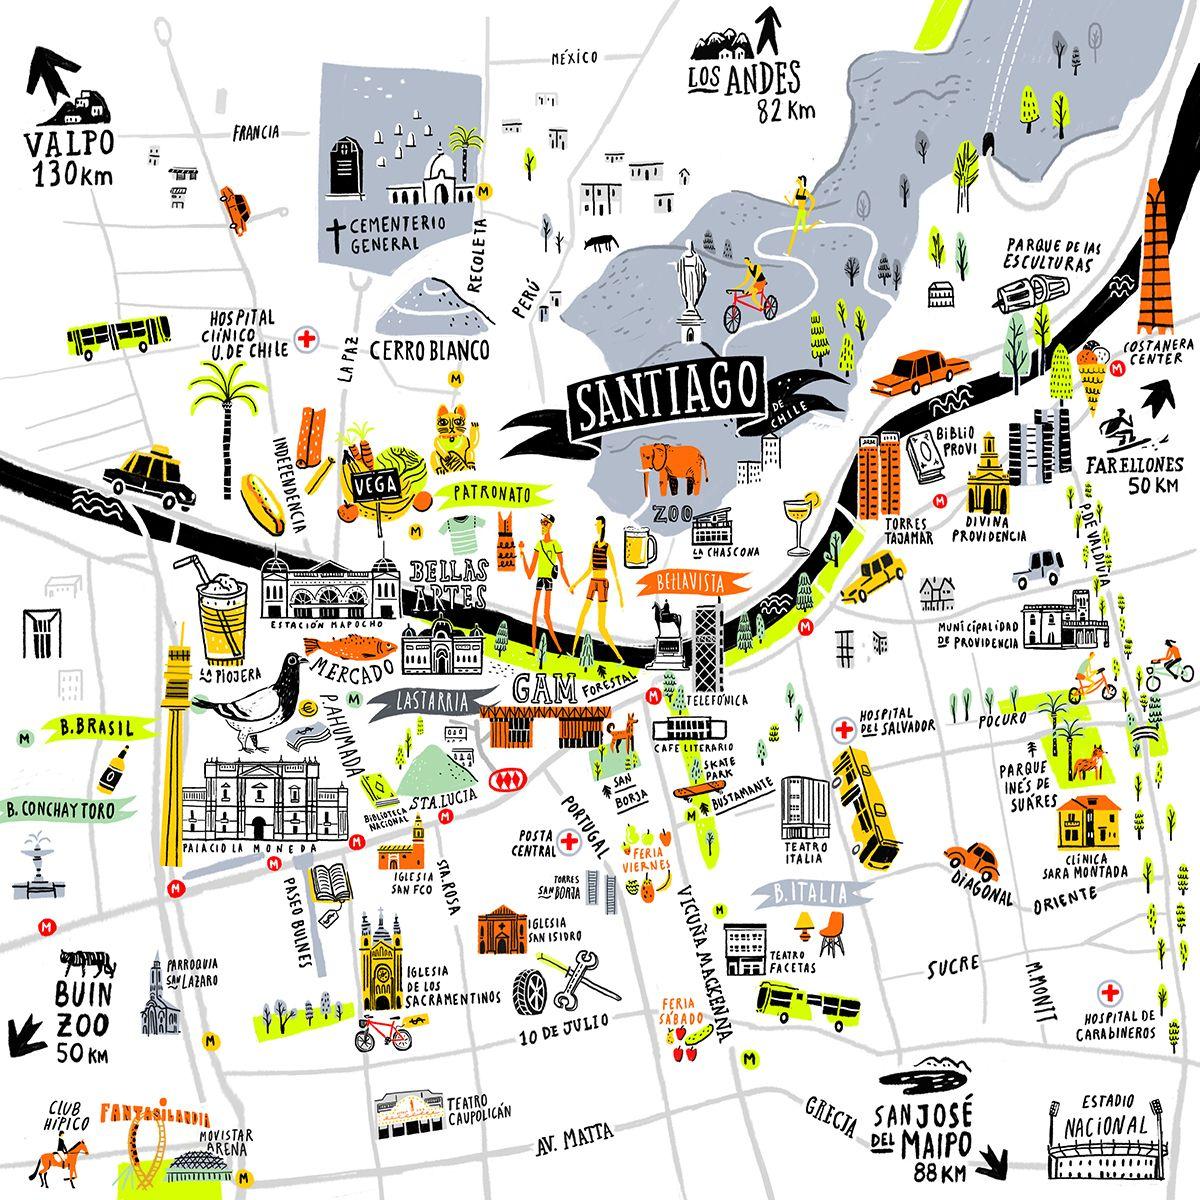 Santiago De Chile Mapa Turistico.Santiago Map Oyemathias Mapa Chile Santiago De Chile Y